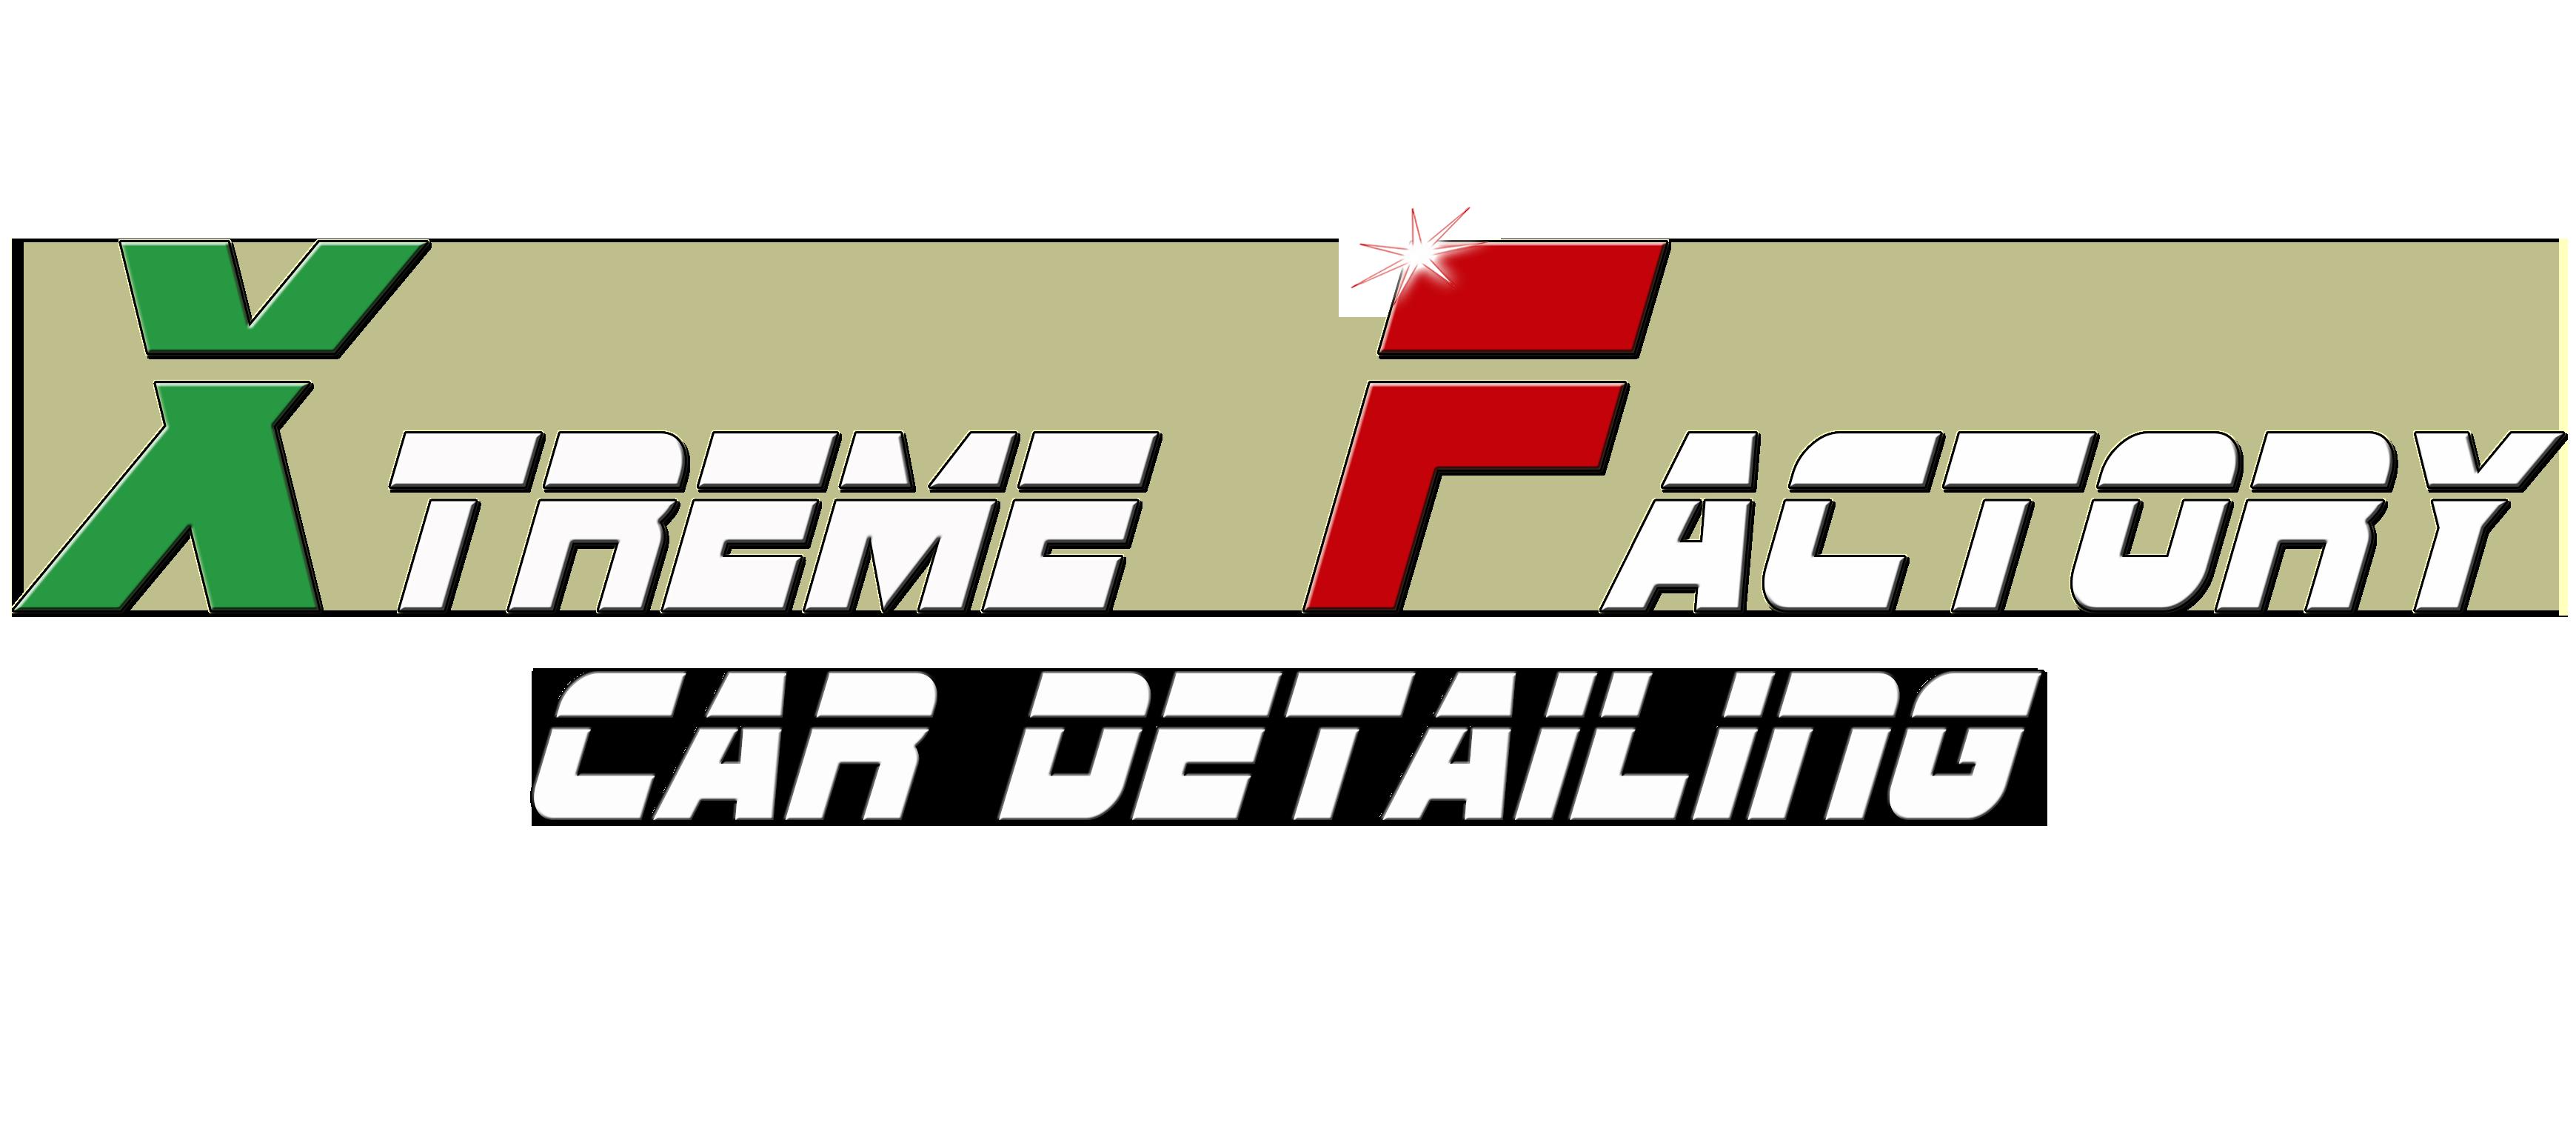 Xtreme-Factory Car Detailing